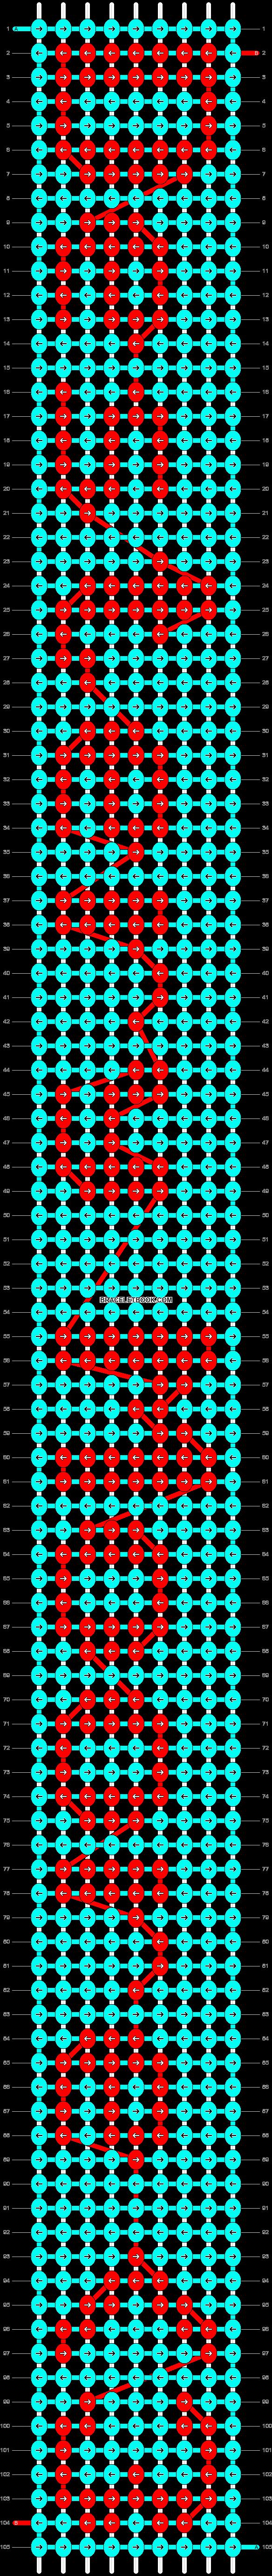 Alpha pattern #6989 pattern